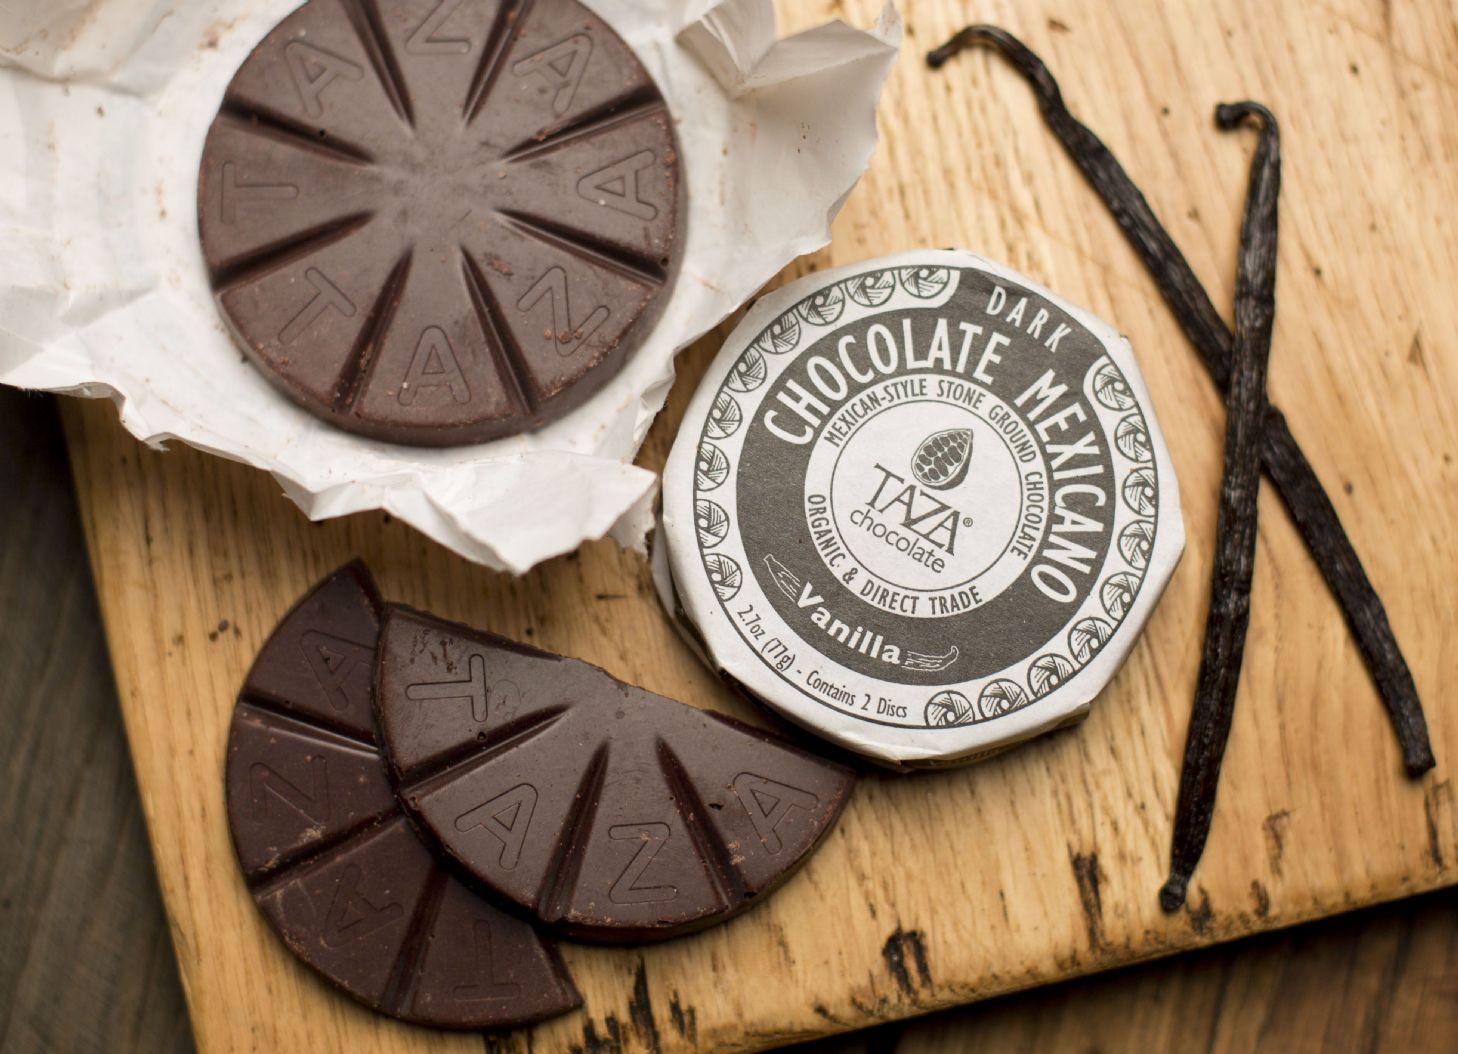 Taza Chocolate (2010) by Joe Domoracki at Coroflot.com